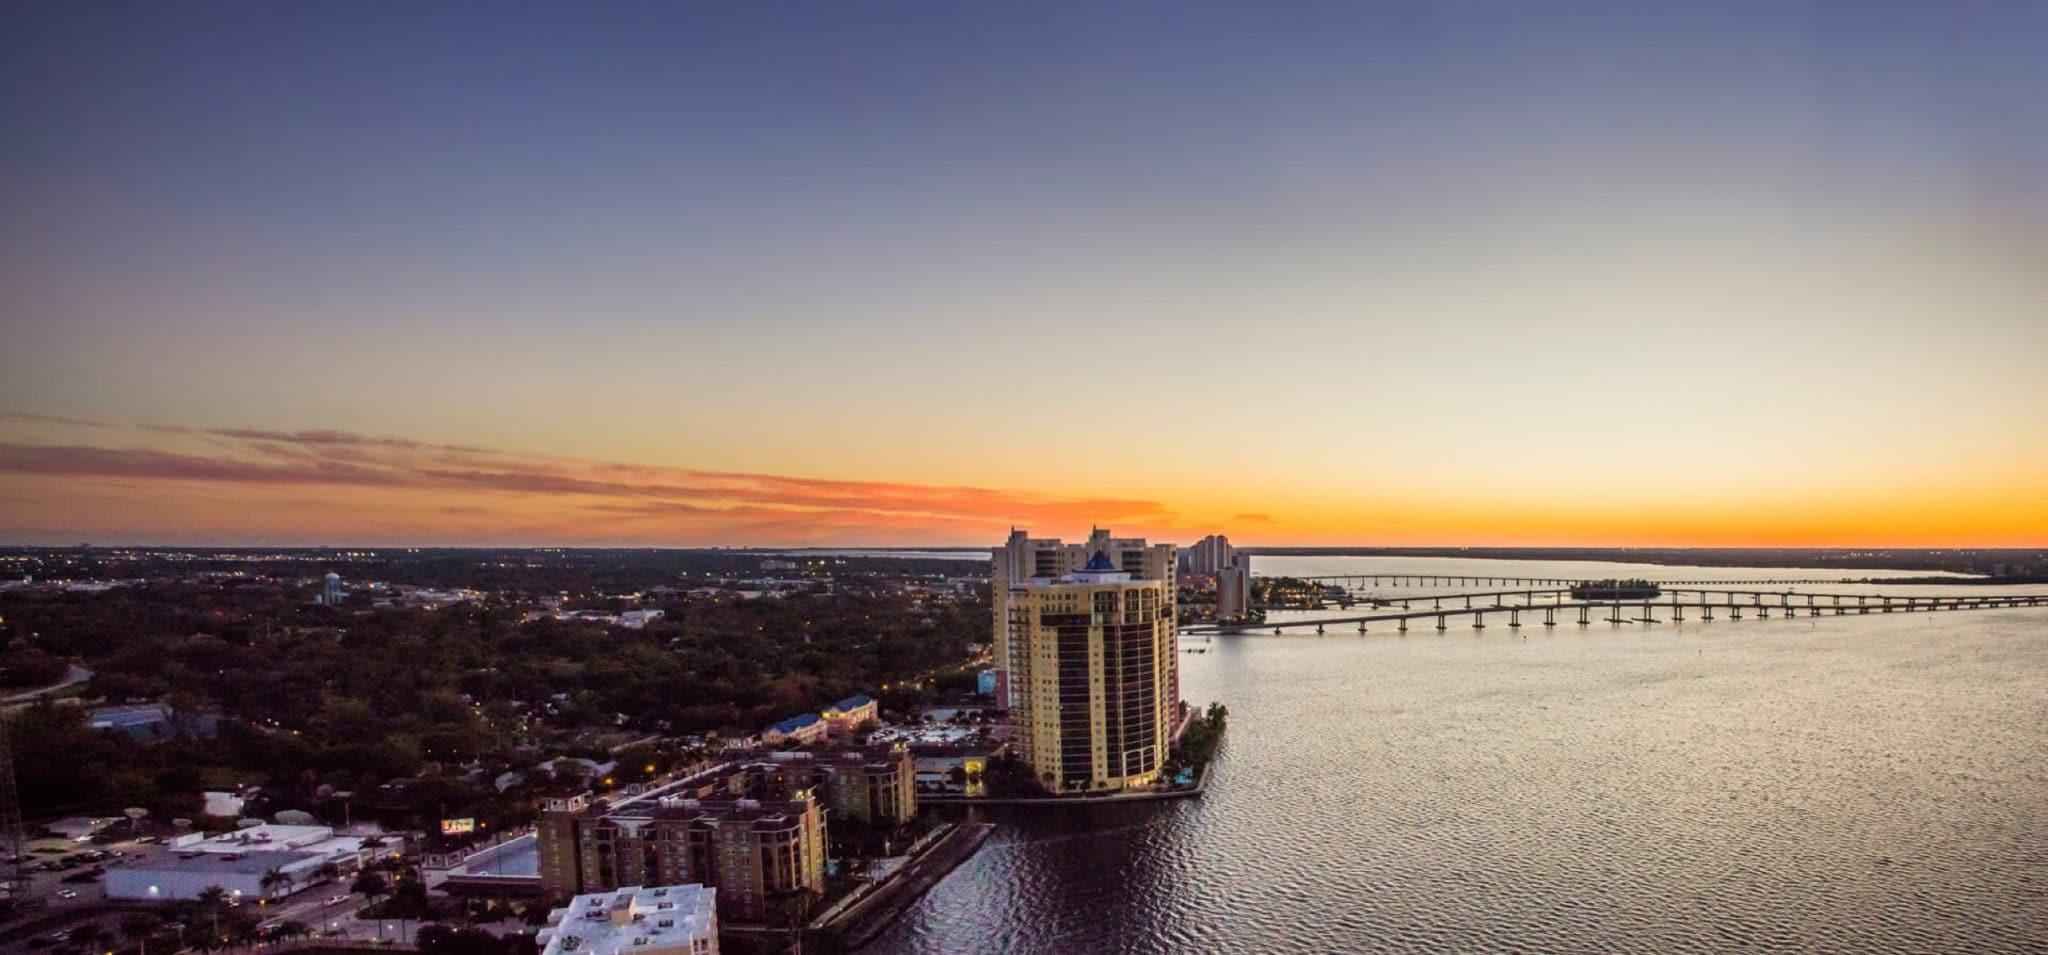 fort-myers-florida-skyline-sunset